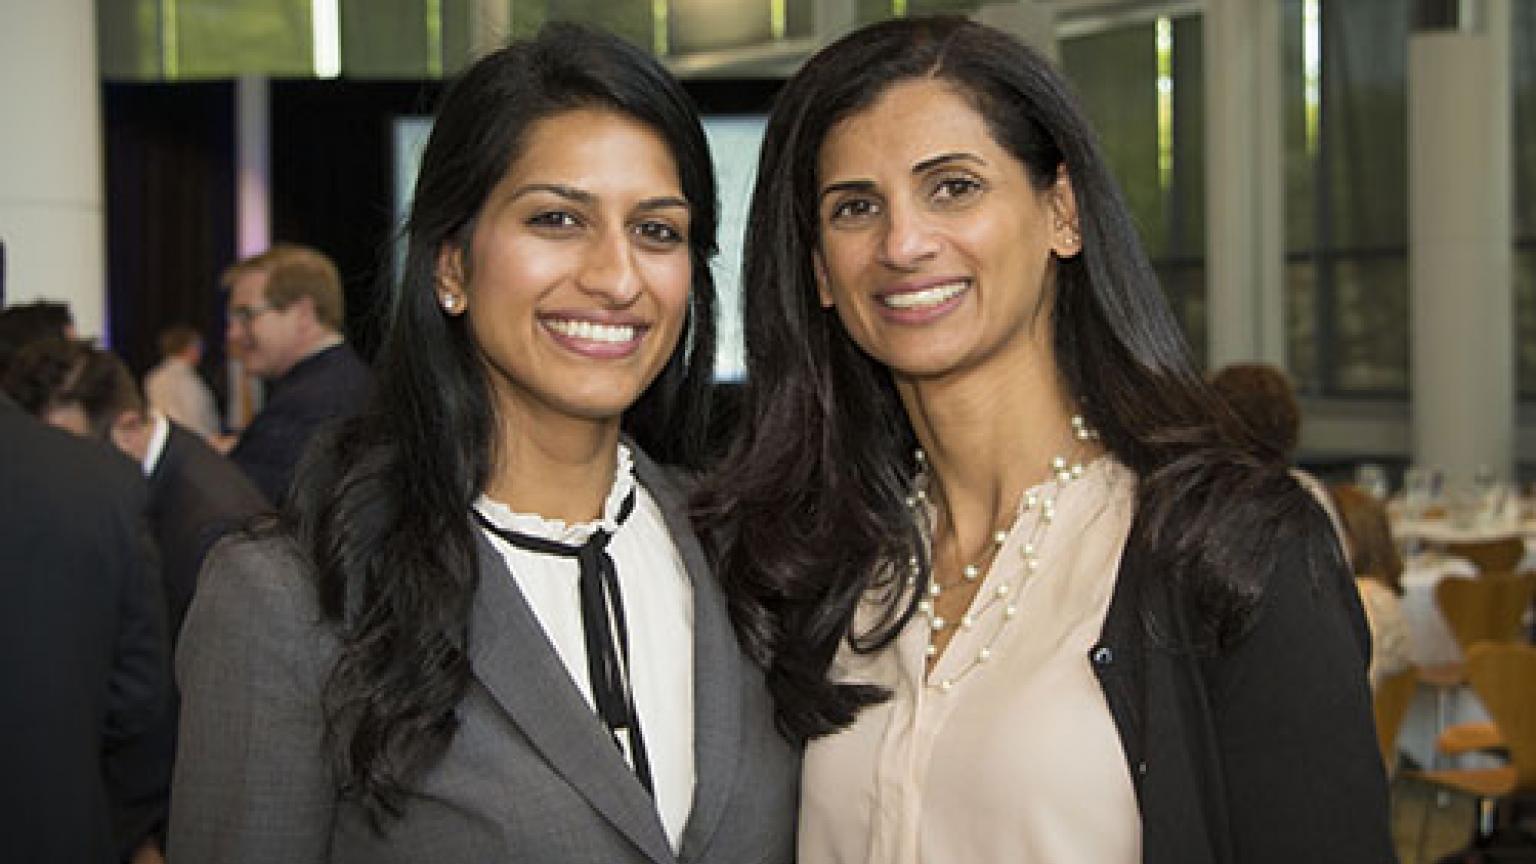 Dr. Sandhu and Kavitha Ranganathan, MD